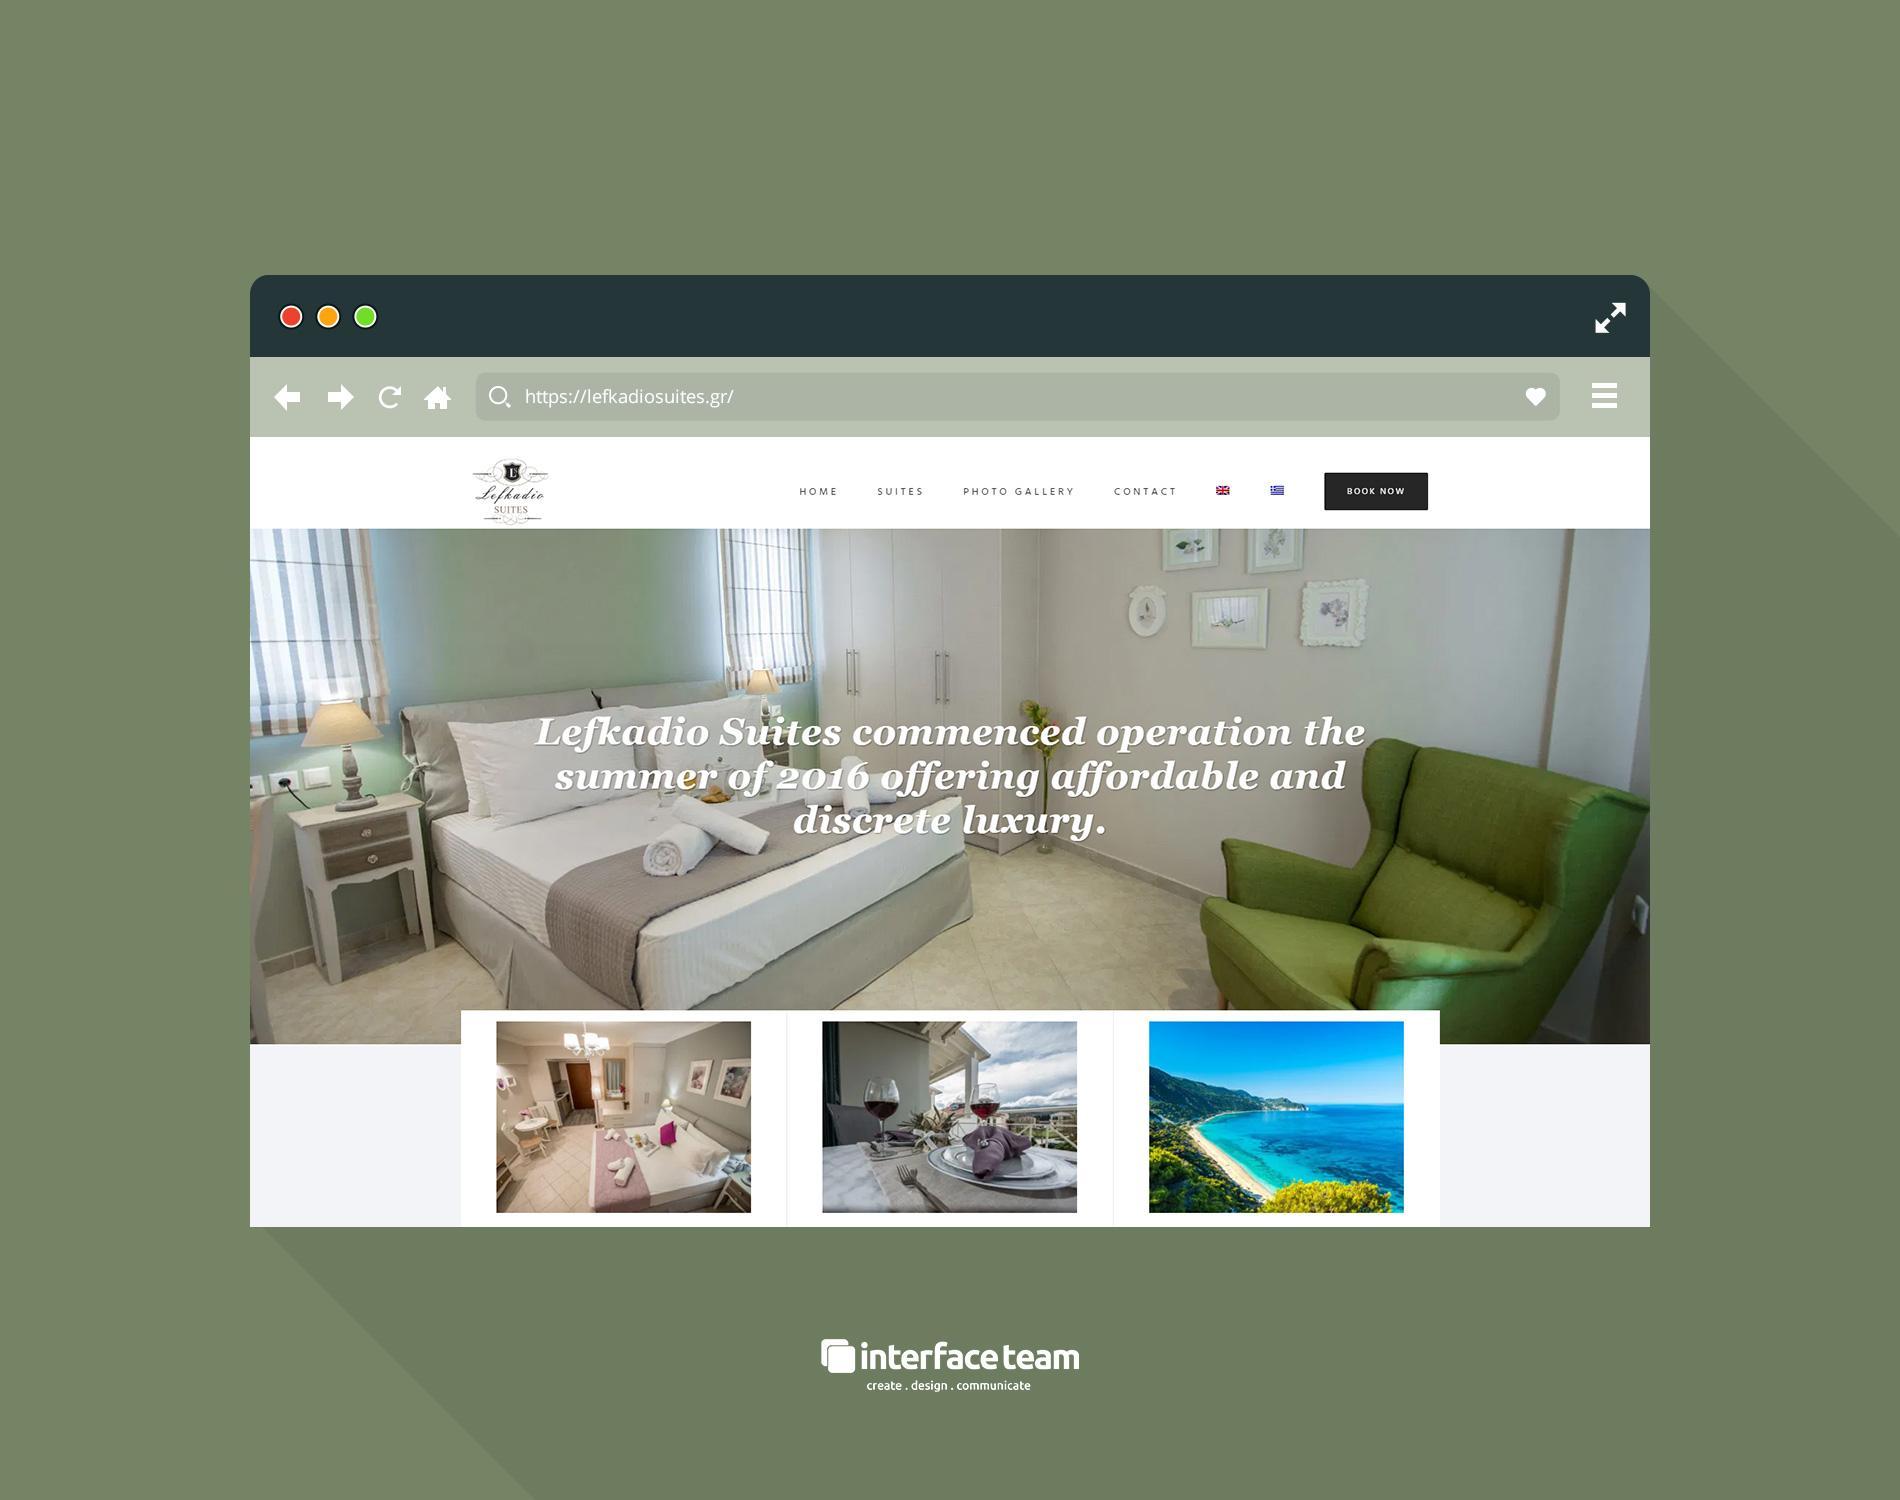 interface-team, κατασκευή ιστοσελίδων